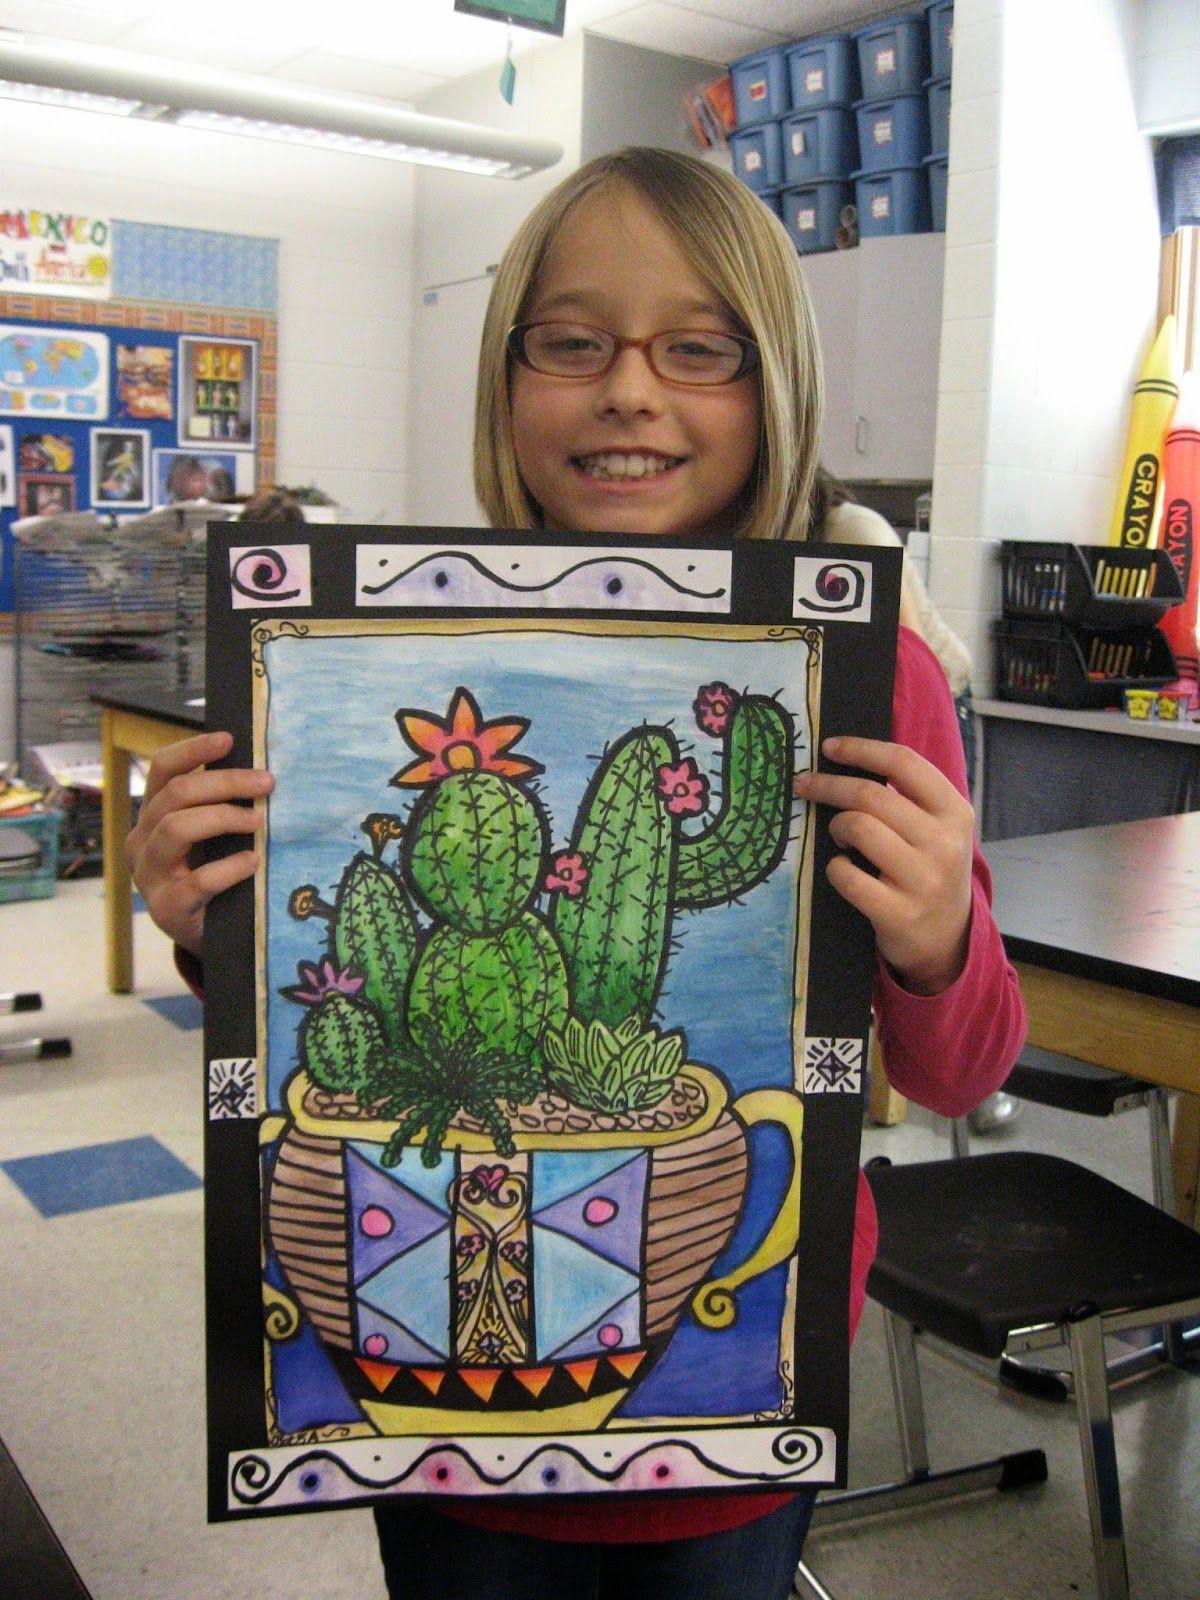 5th Grade Cacti Value Blending Watercolor Pattern